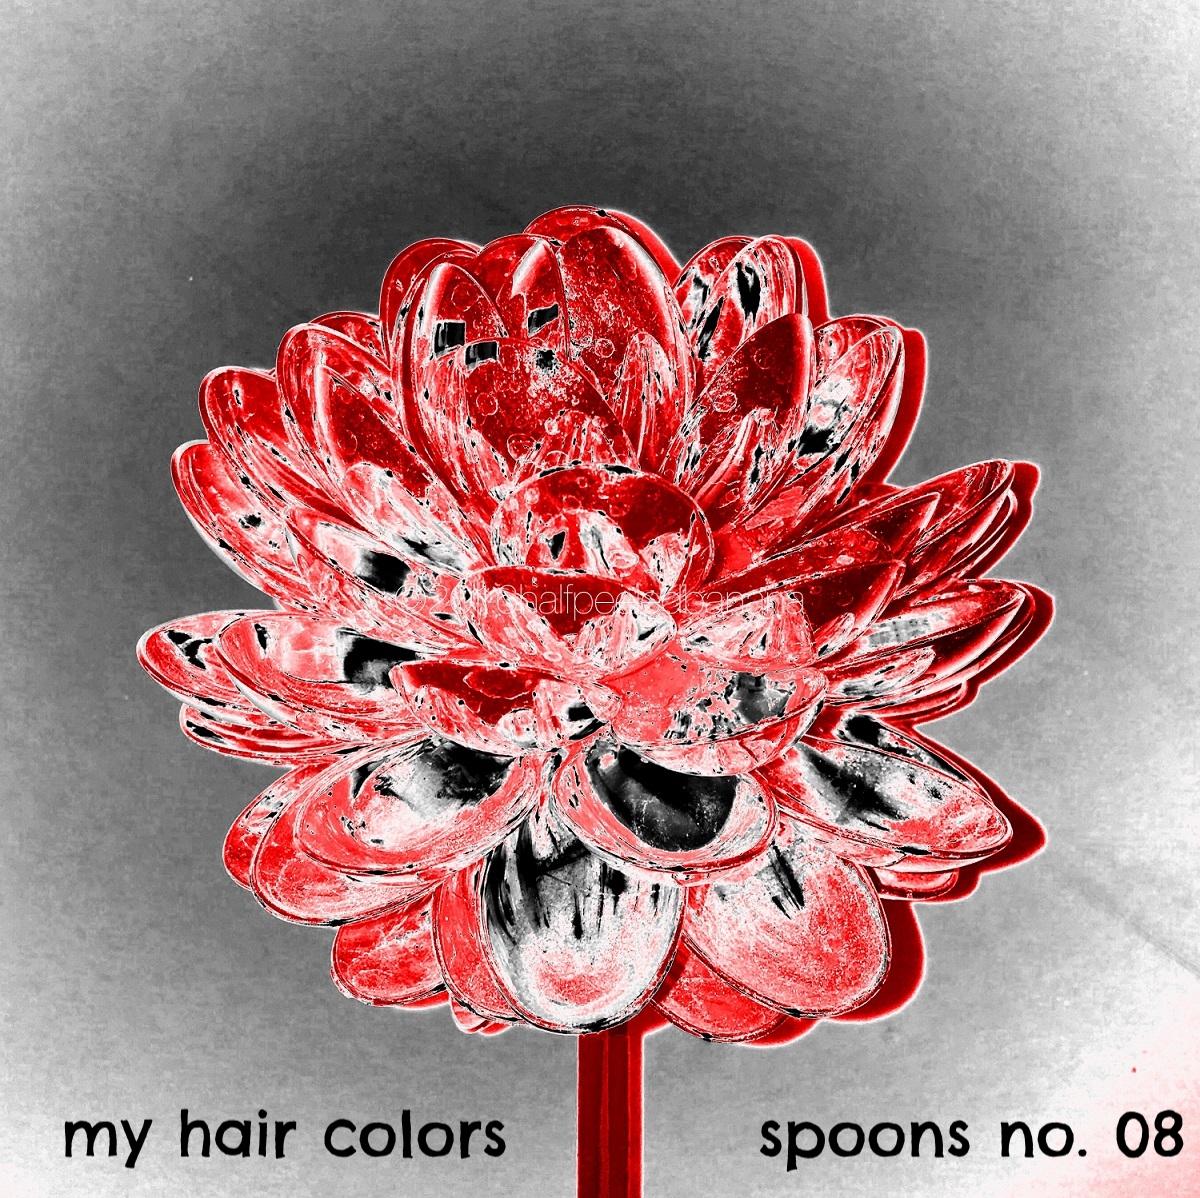 my hair colors